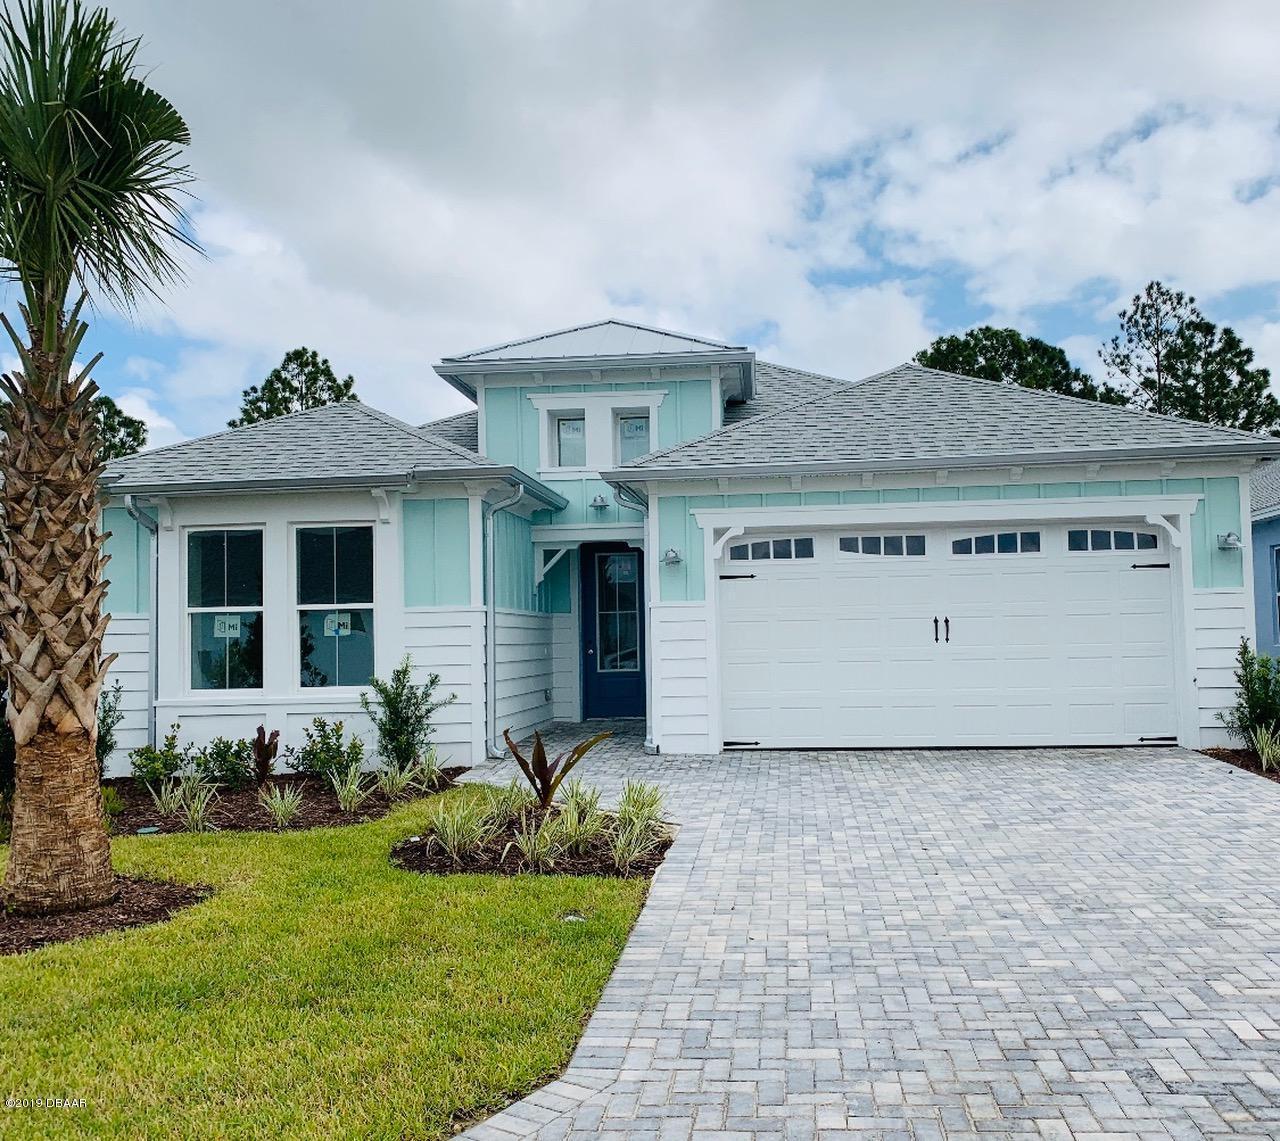 660 W Landshark Boulevard, South Daytona, Florida